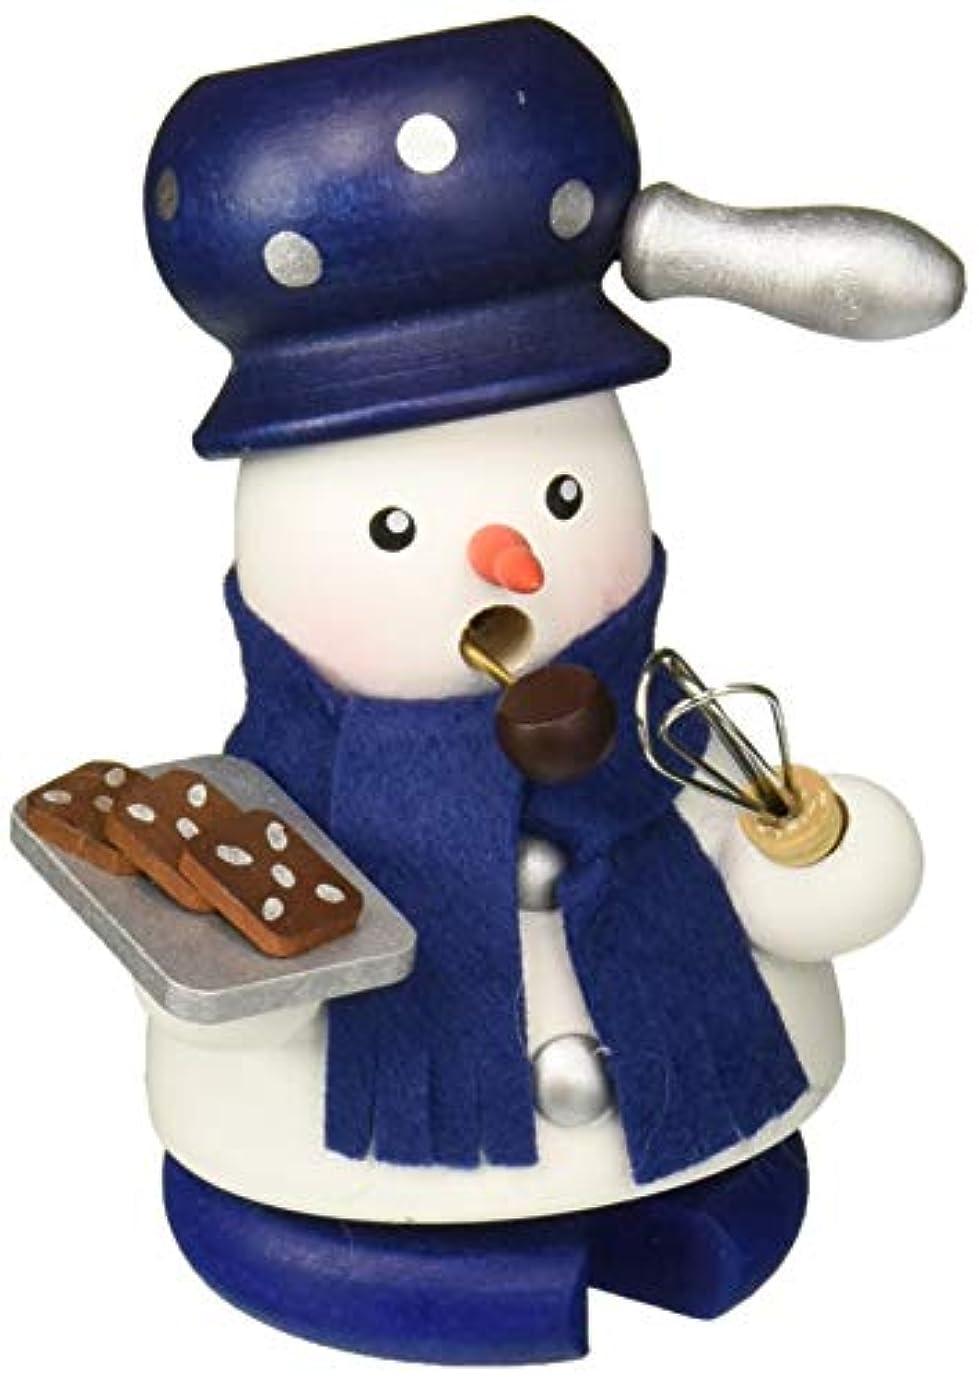 Alexander Taron Christian Ulbricht装飾雪だるまBaker Incense Burner